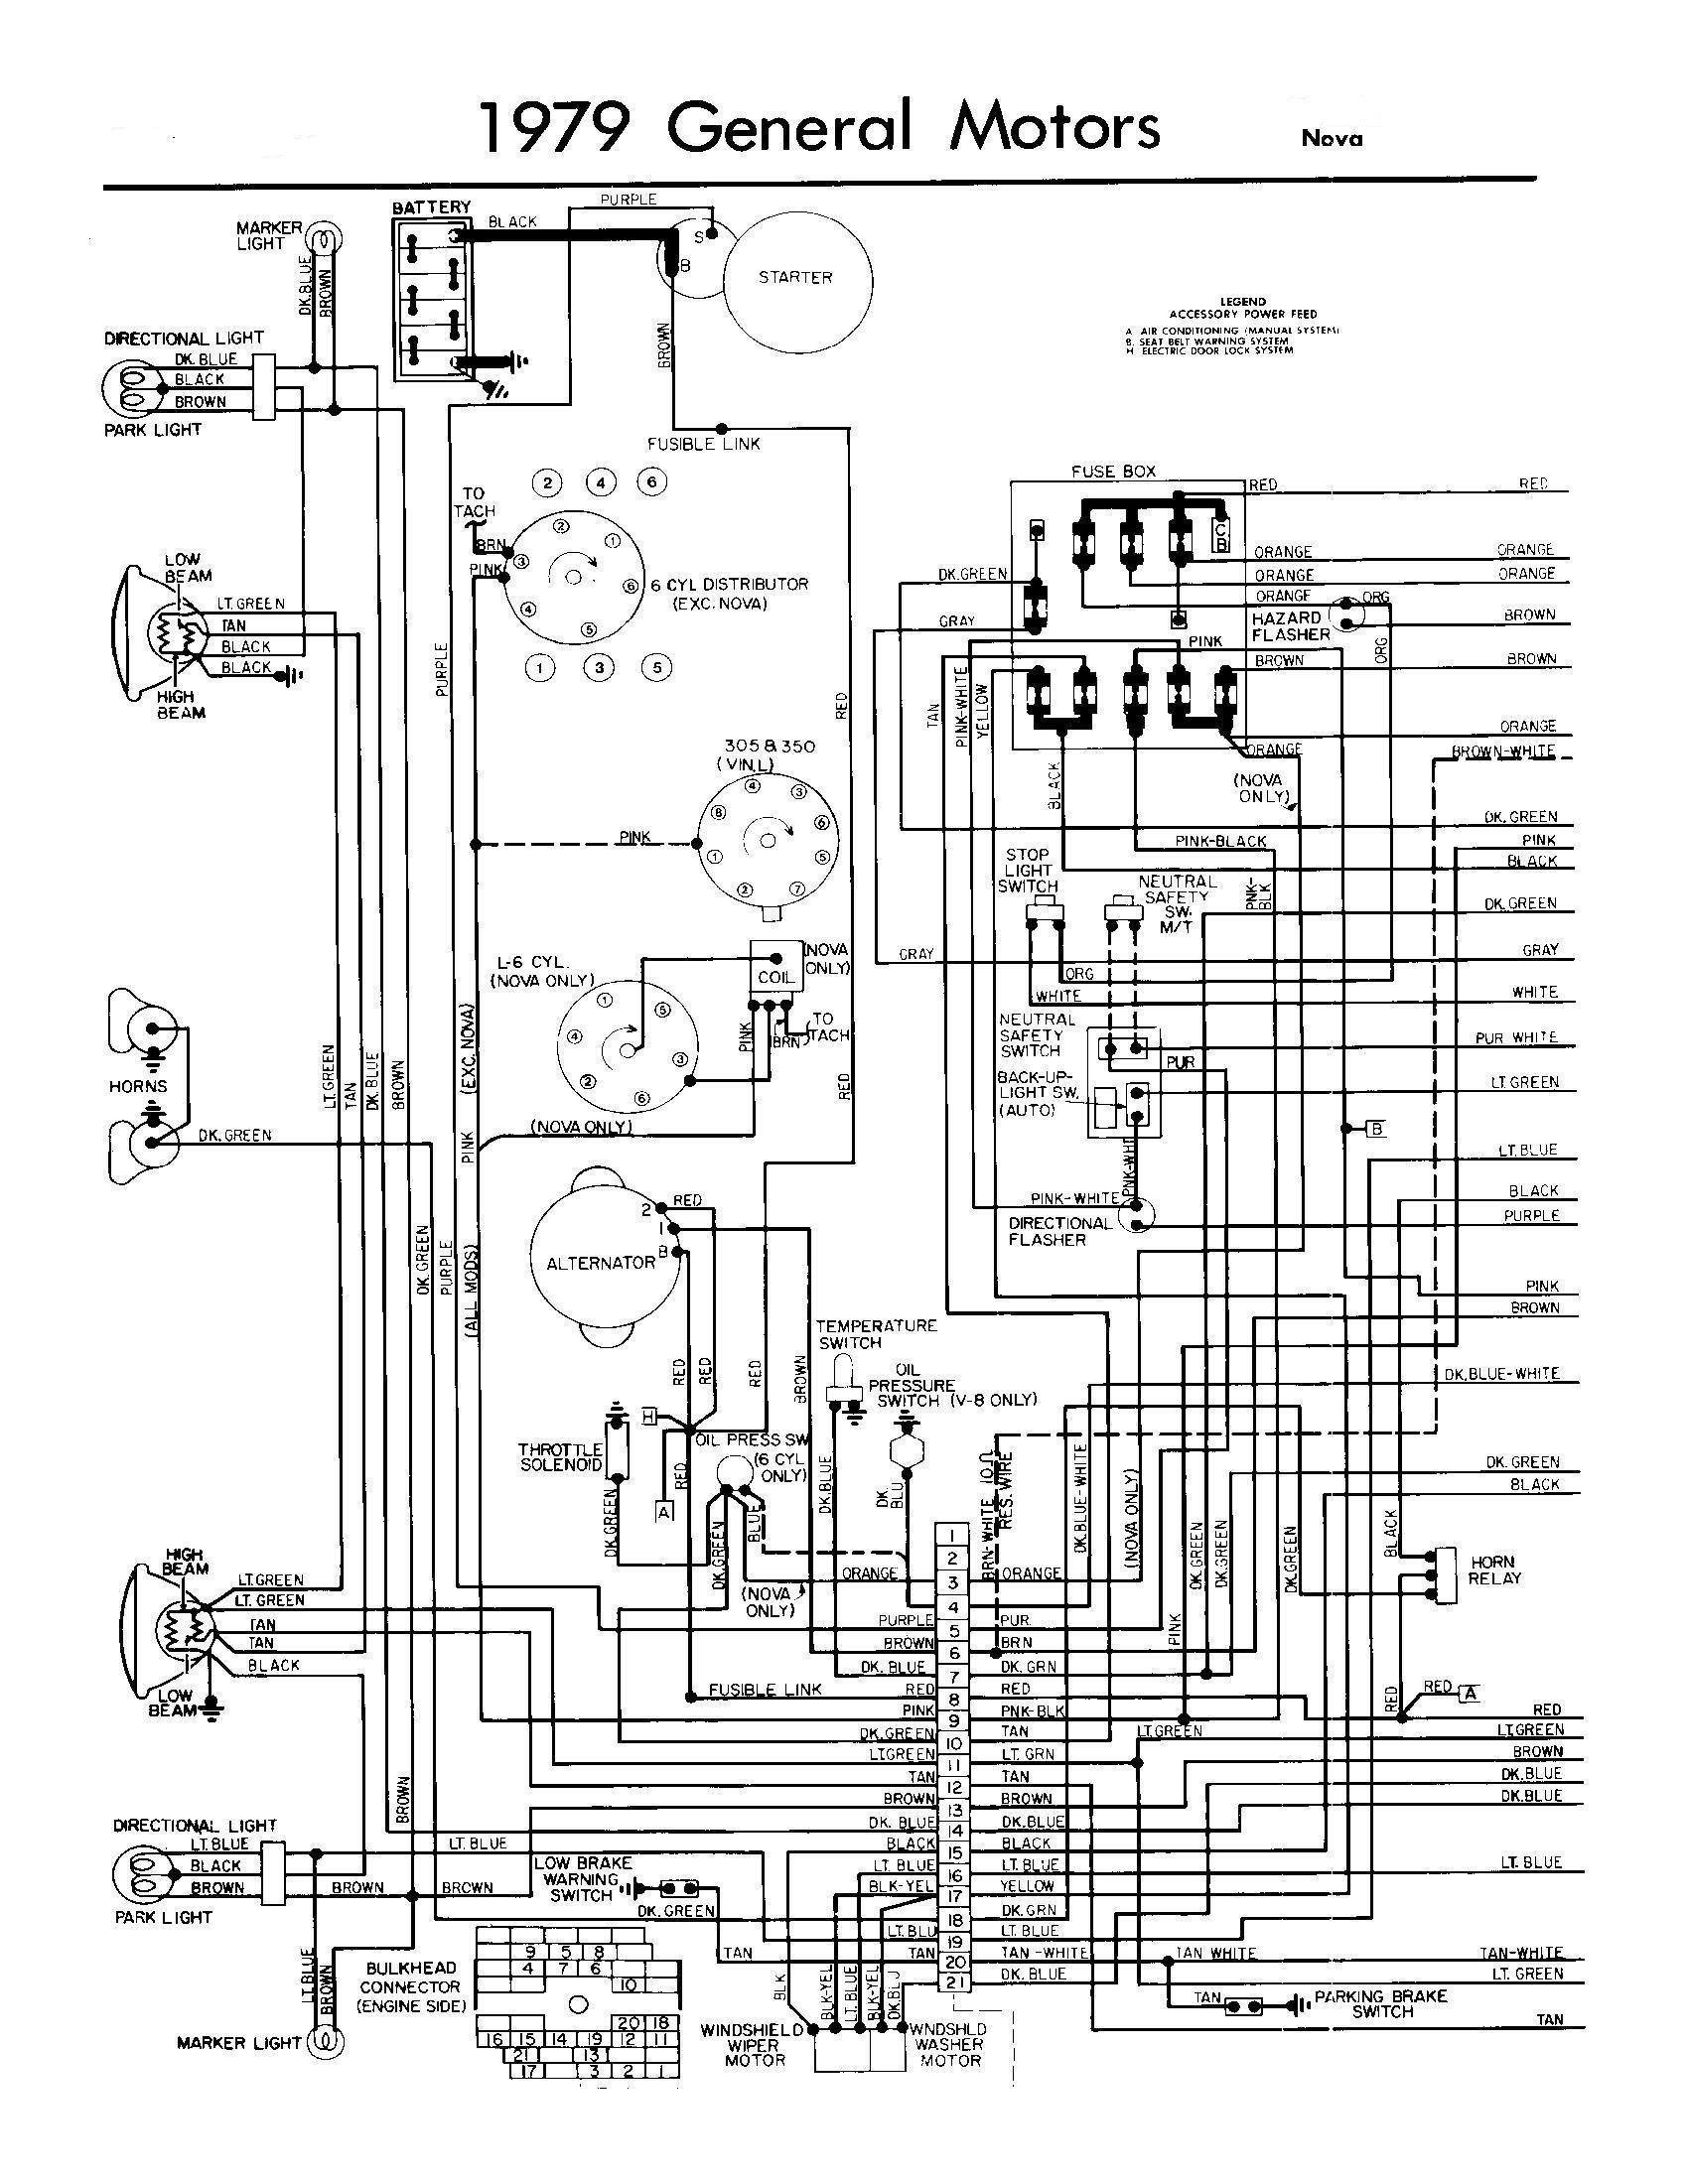 Brake Light Wiring Diagram 1994 Gmc Sierra 1978 Chevy Truck Tail Light Wiring Harness Diagram Simple Of Brake Light Wiring Diagram 1994 Gmc Sierra